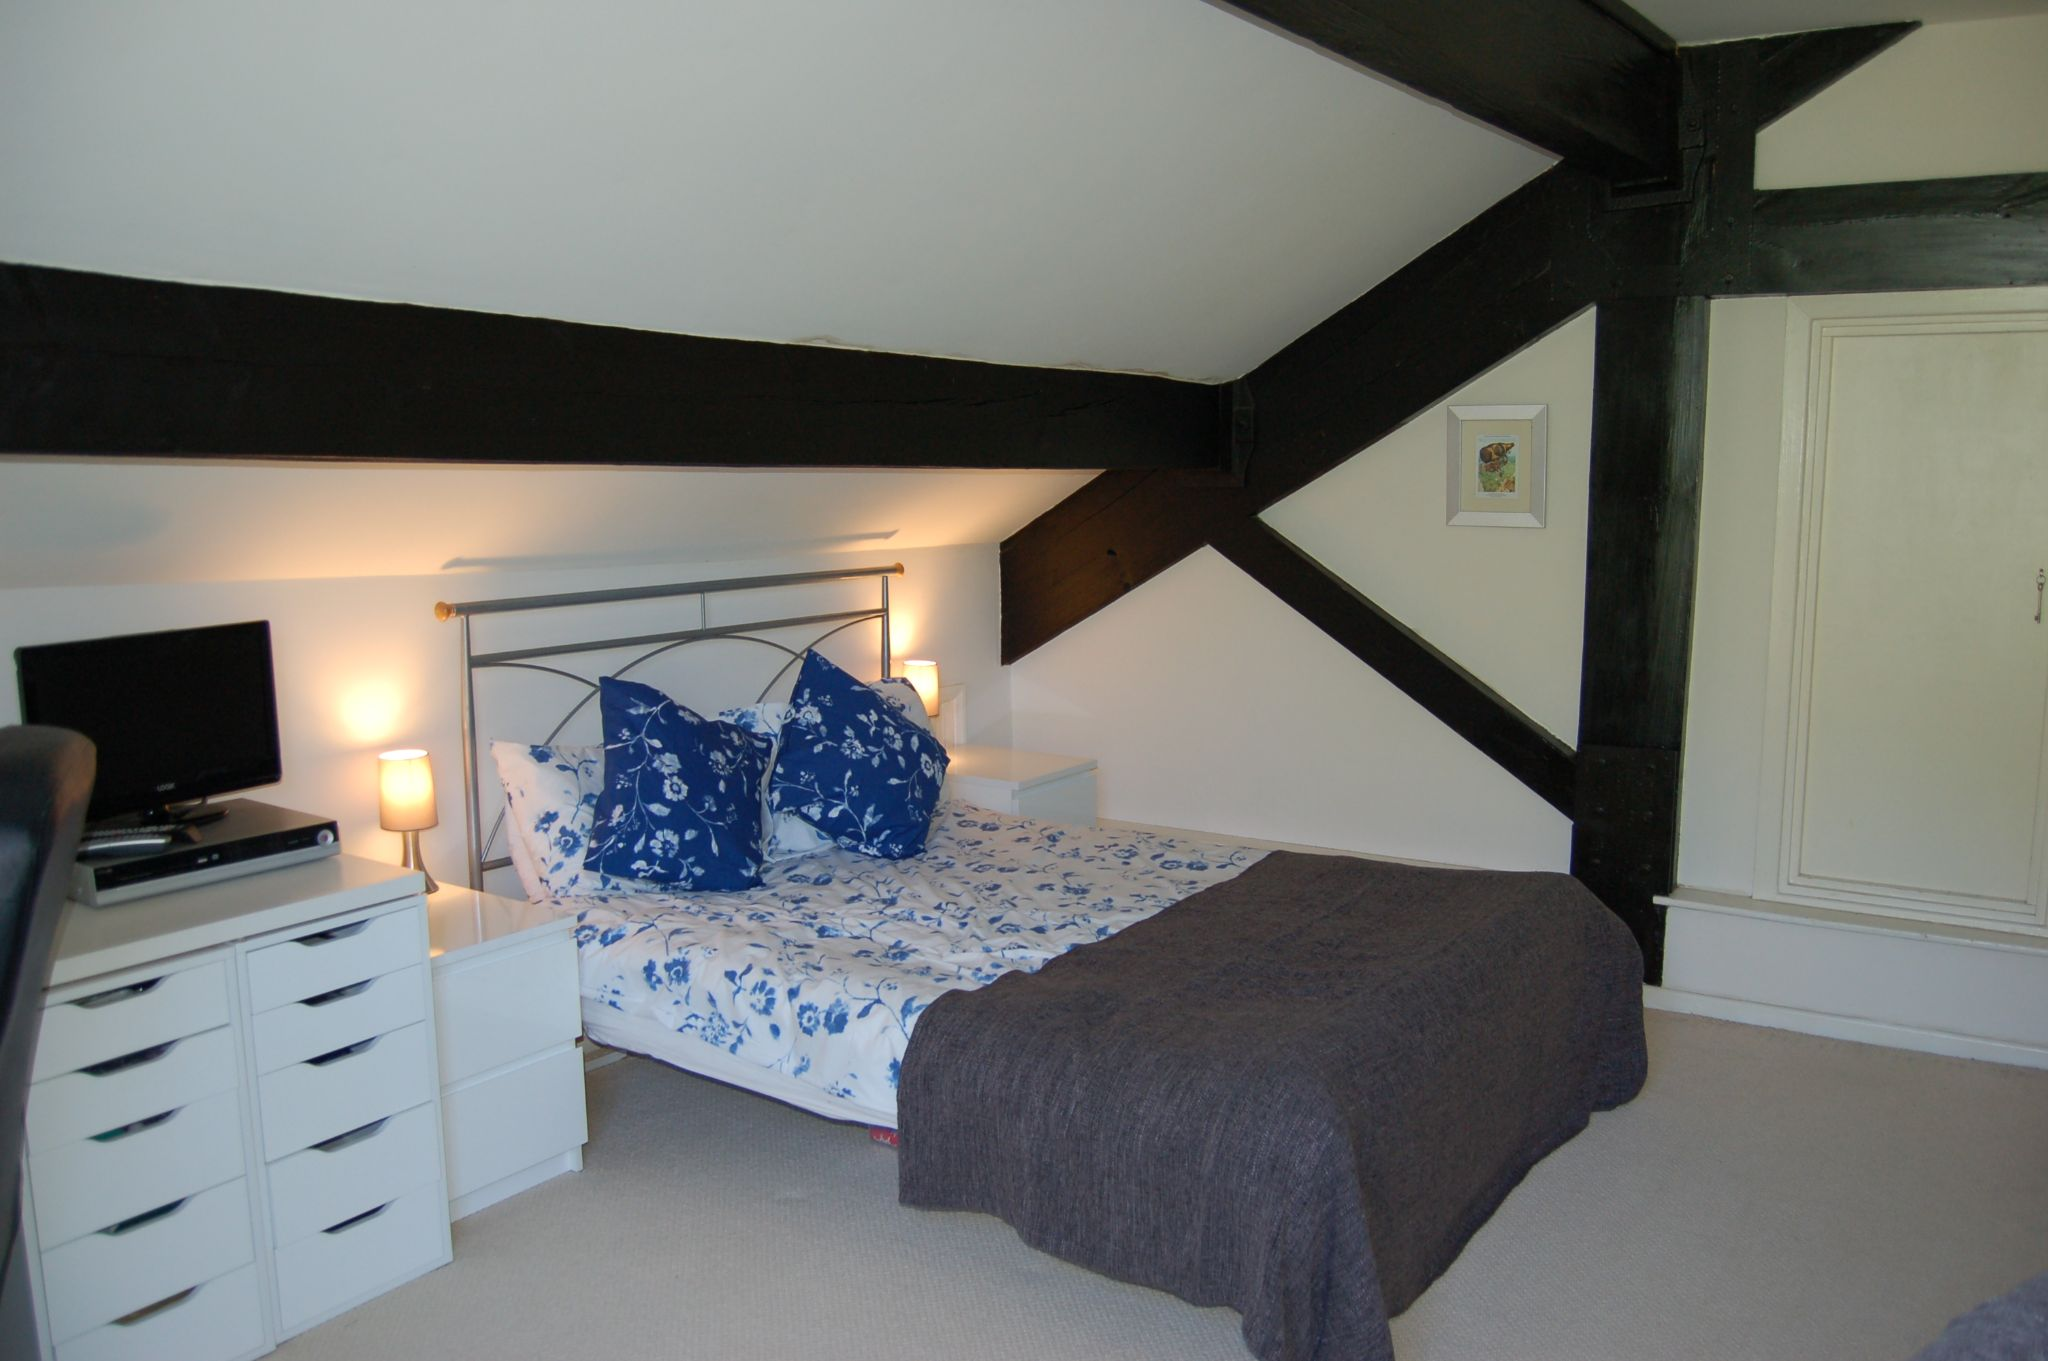 5 bedroom barn conversion house SSTC in Hebden Bridge - Photograph 10